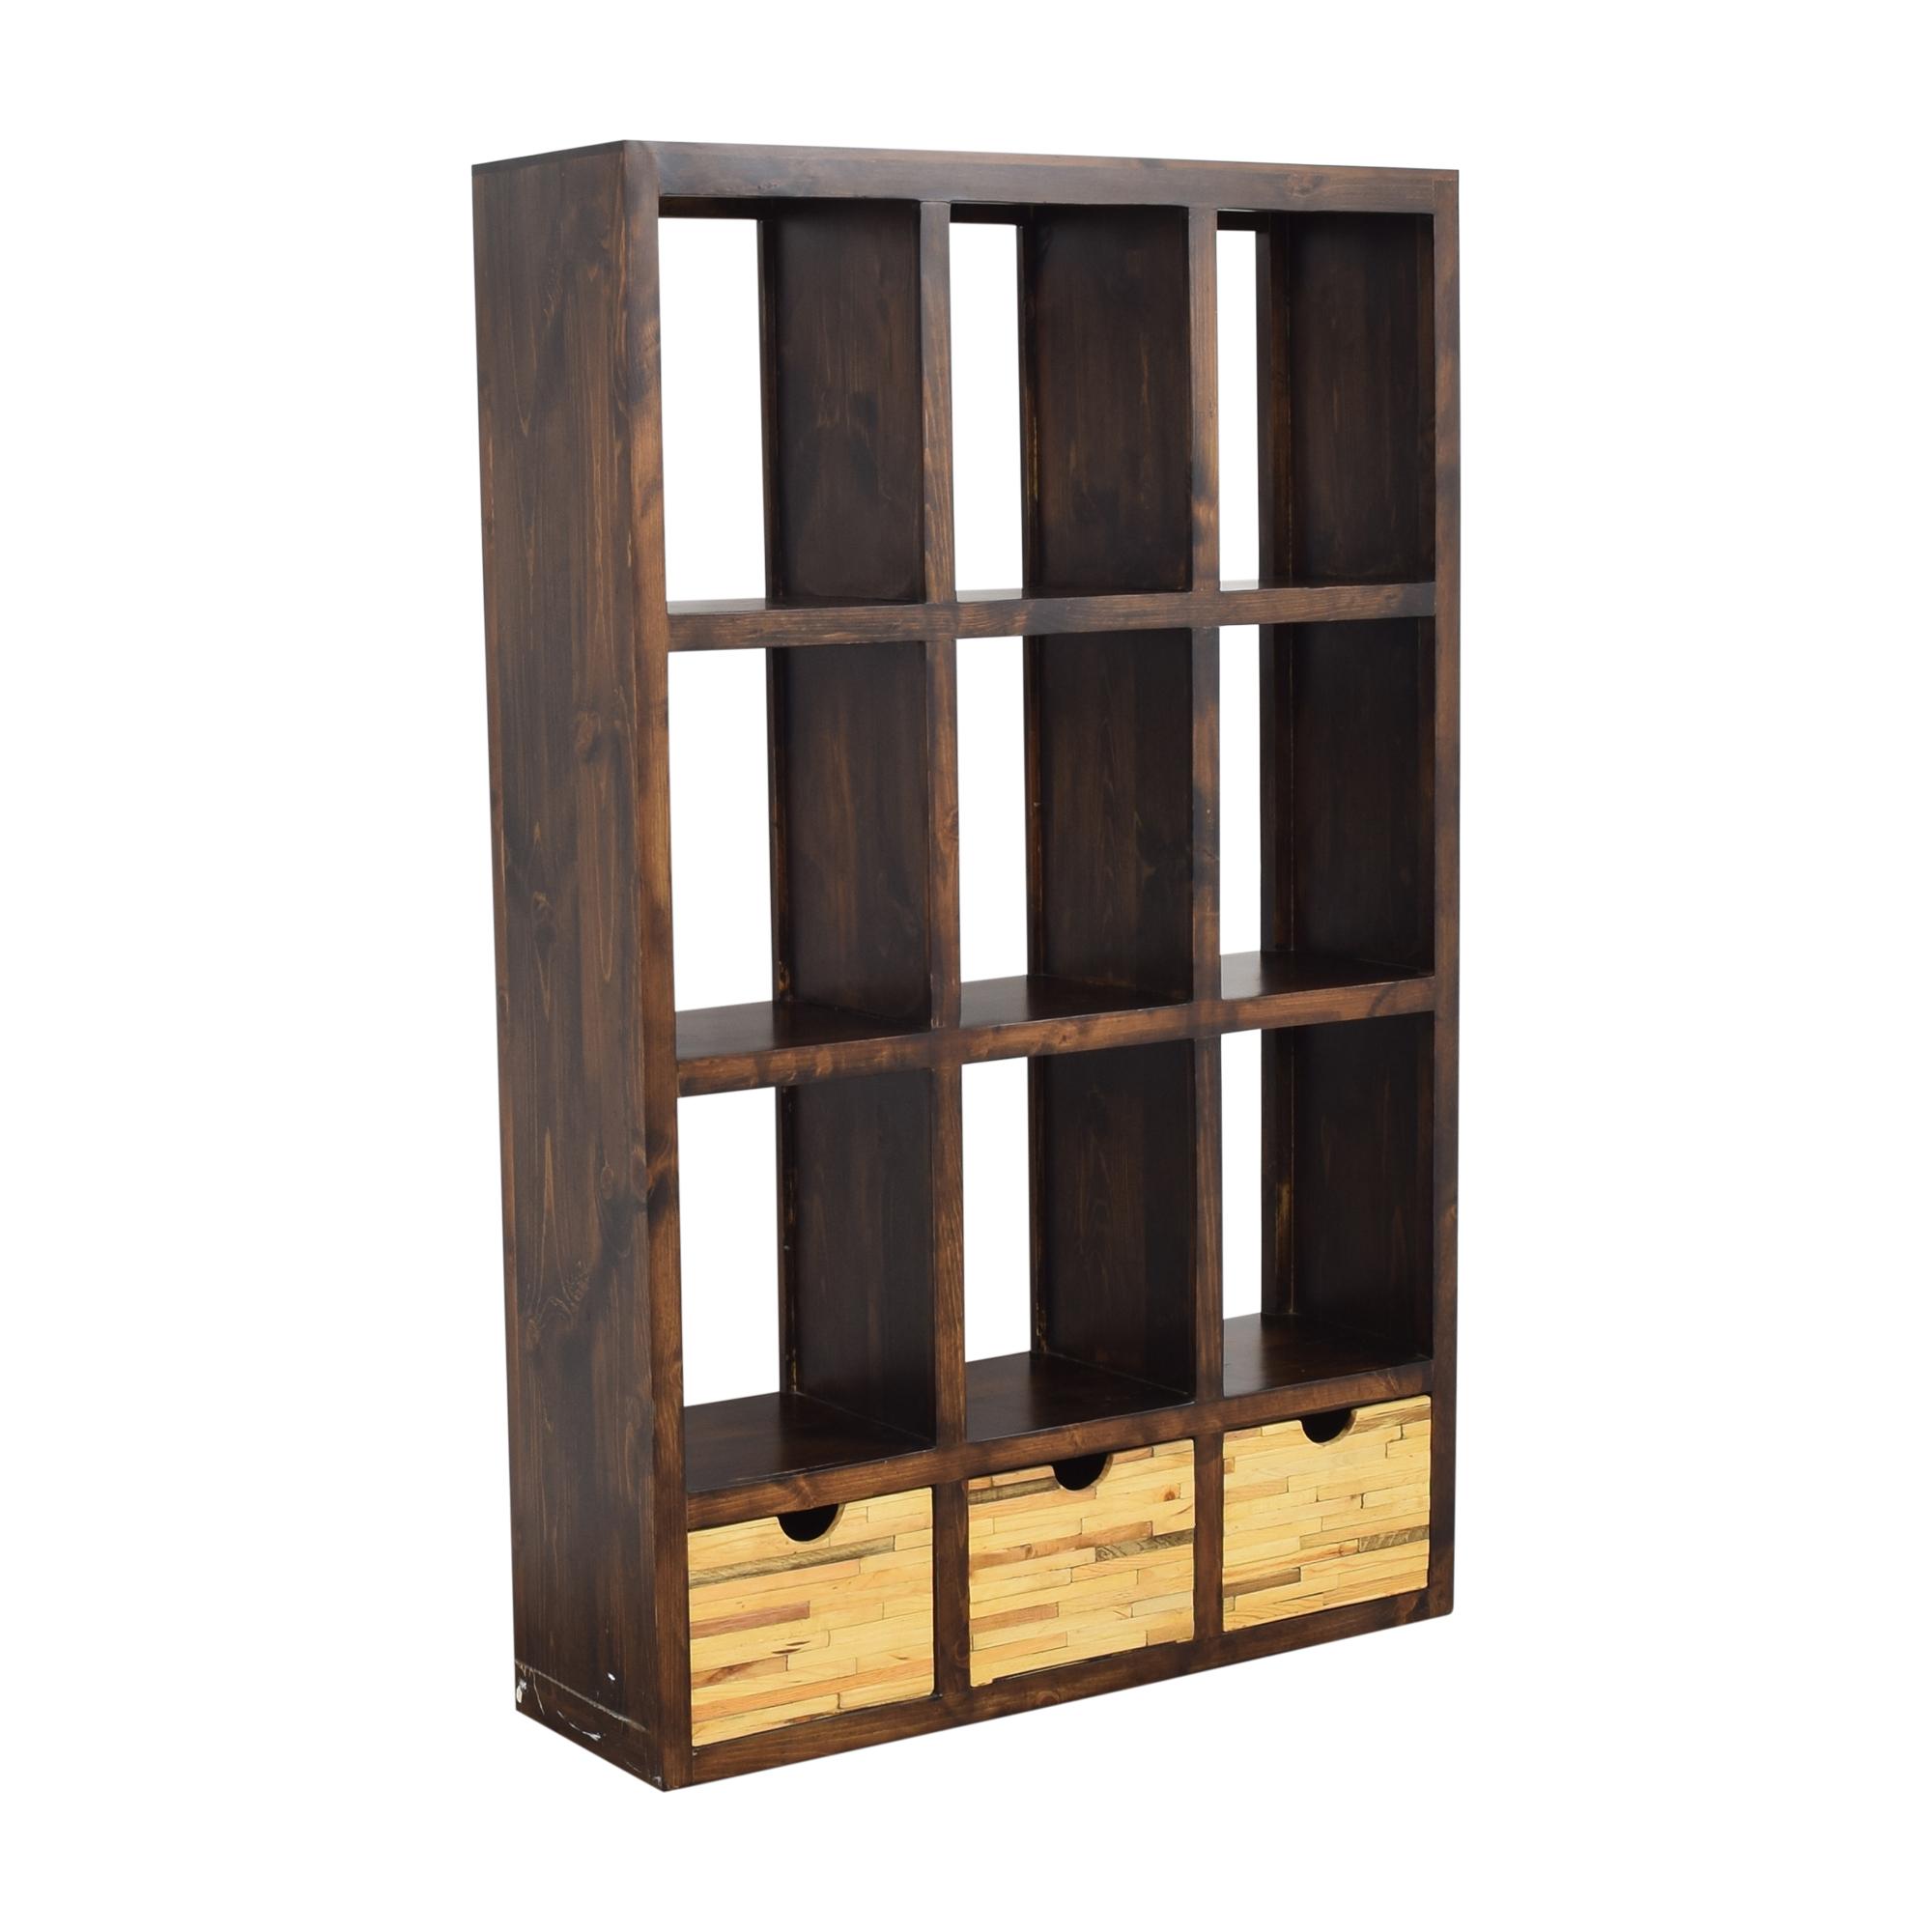 Display Bookshelf with Storage price